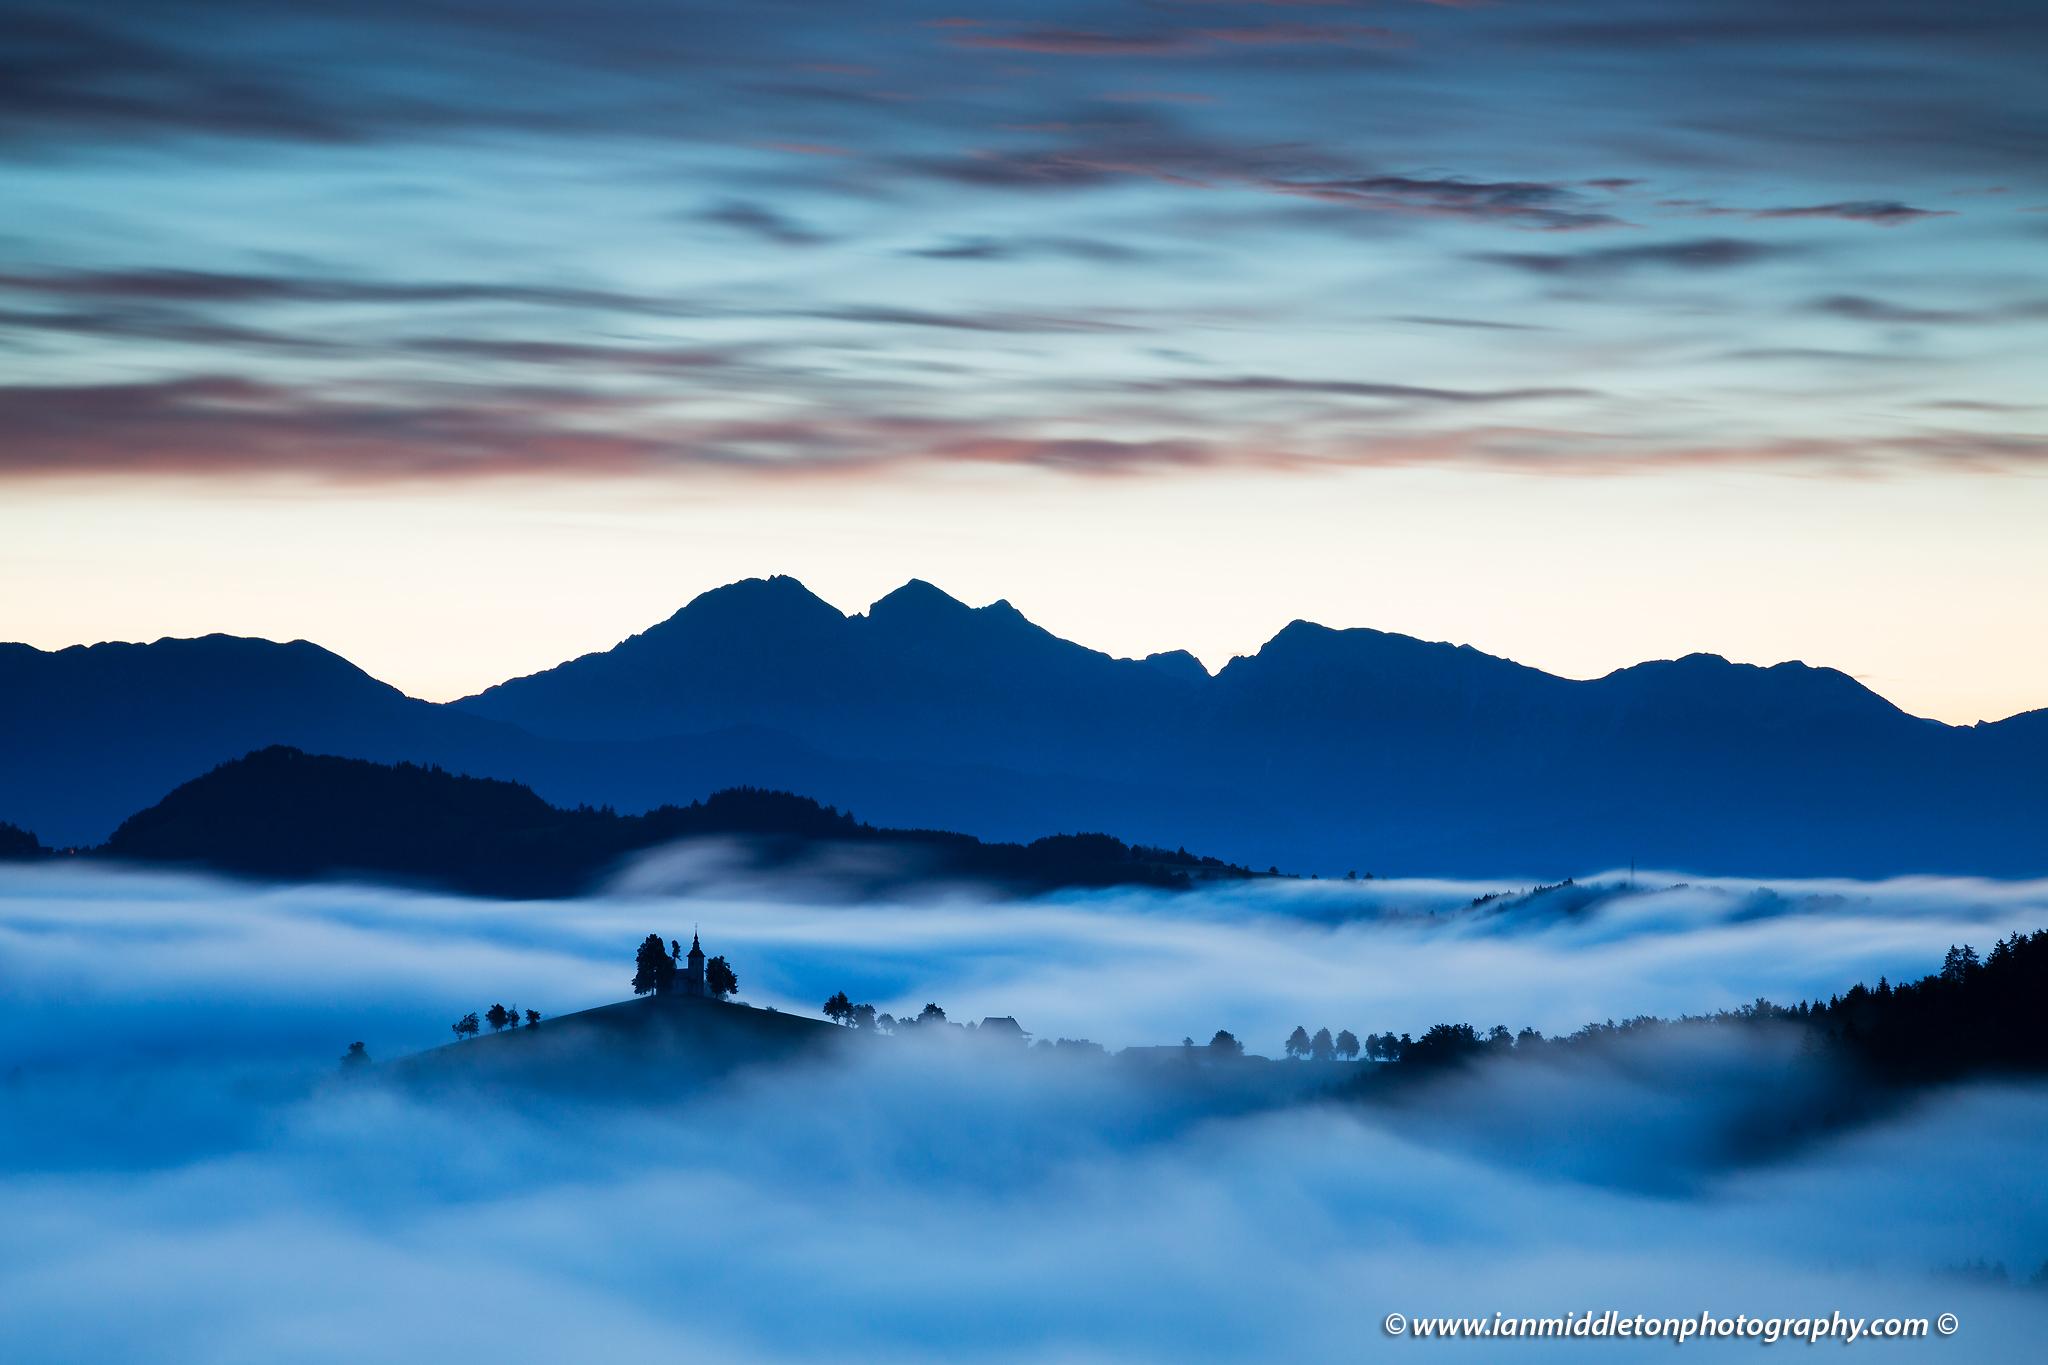 View at dawn from Rantovše hill across to Sveti Tomaz nad Praprotnim (church of Saint Thomas) and the Kamnik Alps, Slovenia.